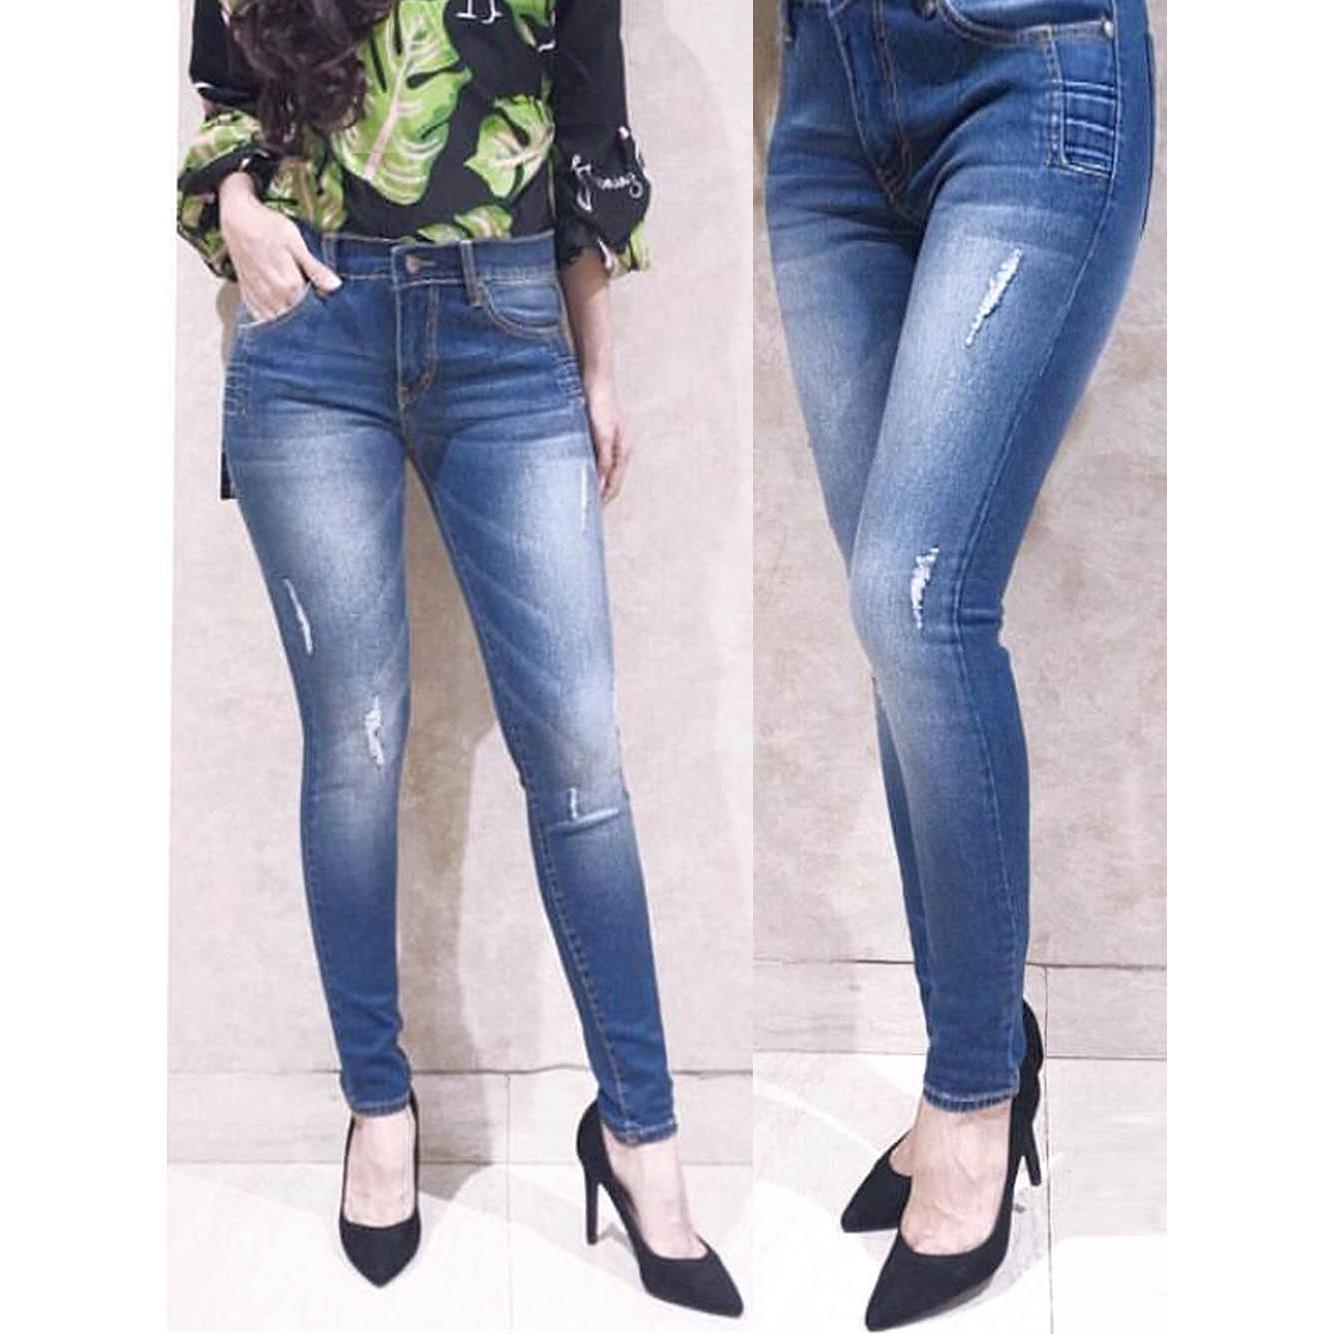 Celana Jeans Wanita - Ripped Whis DMD 659 BTN - ANCIEN STORE